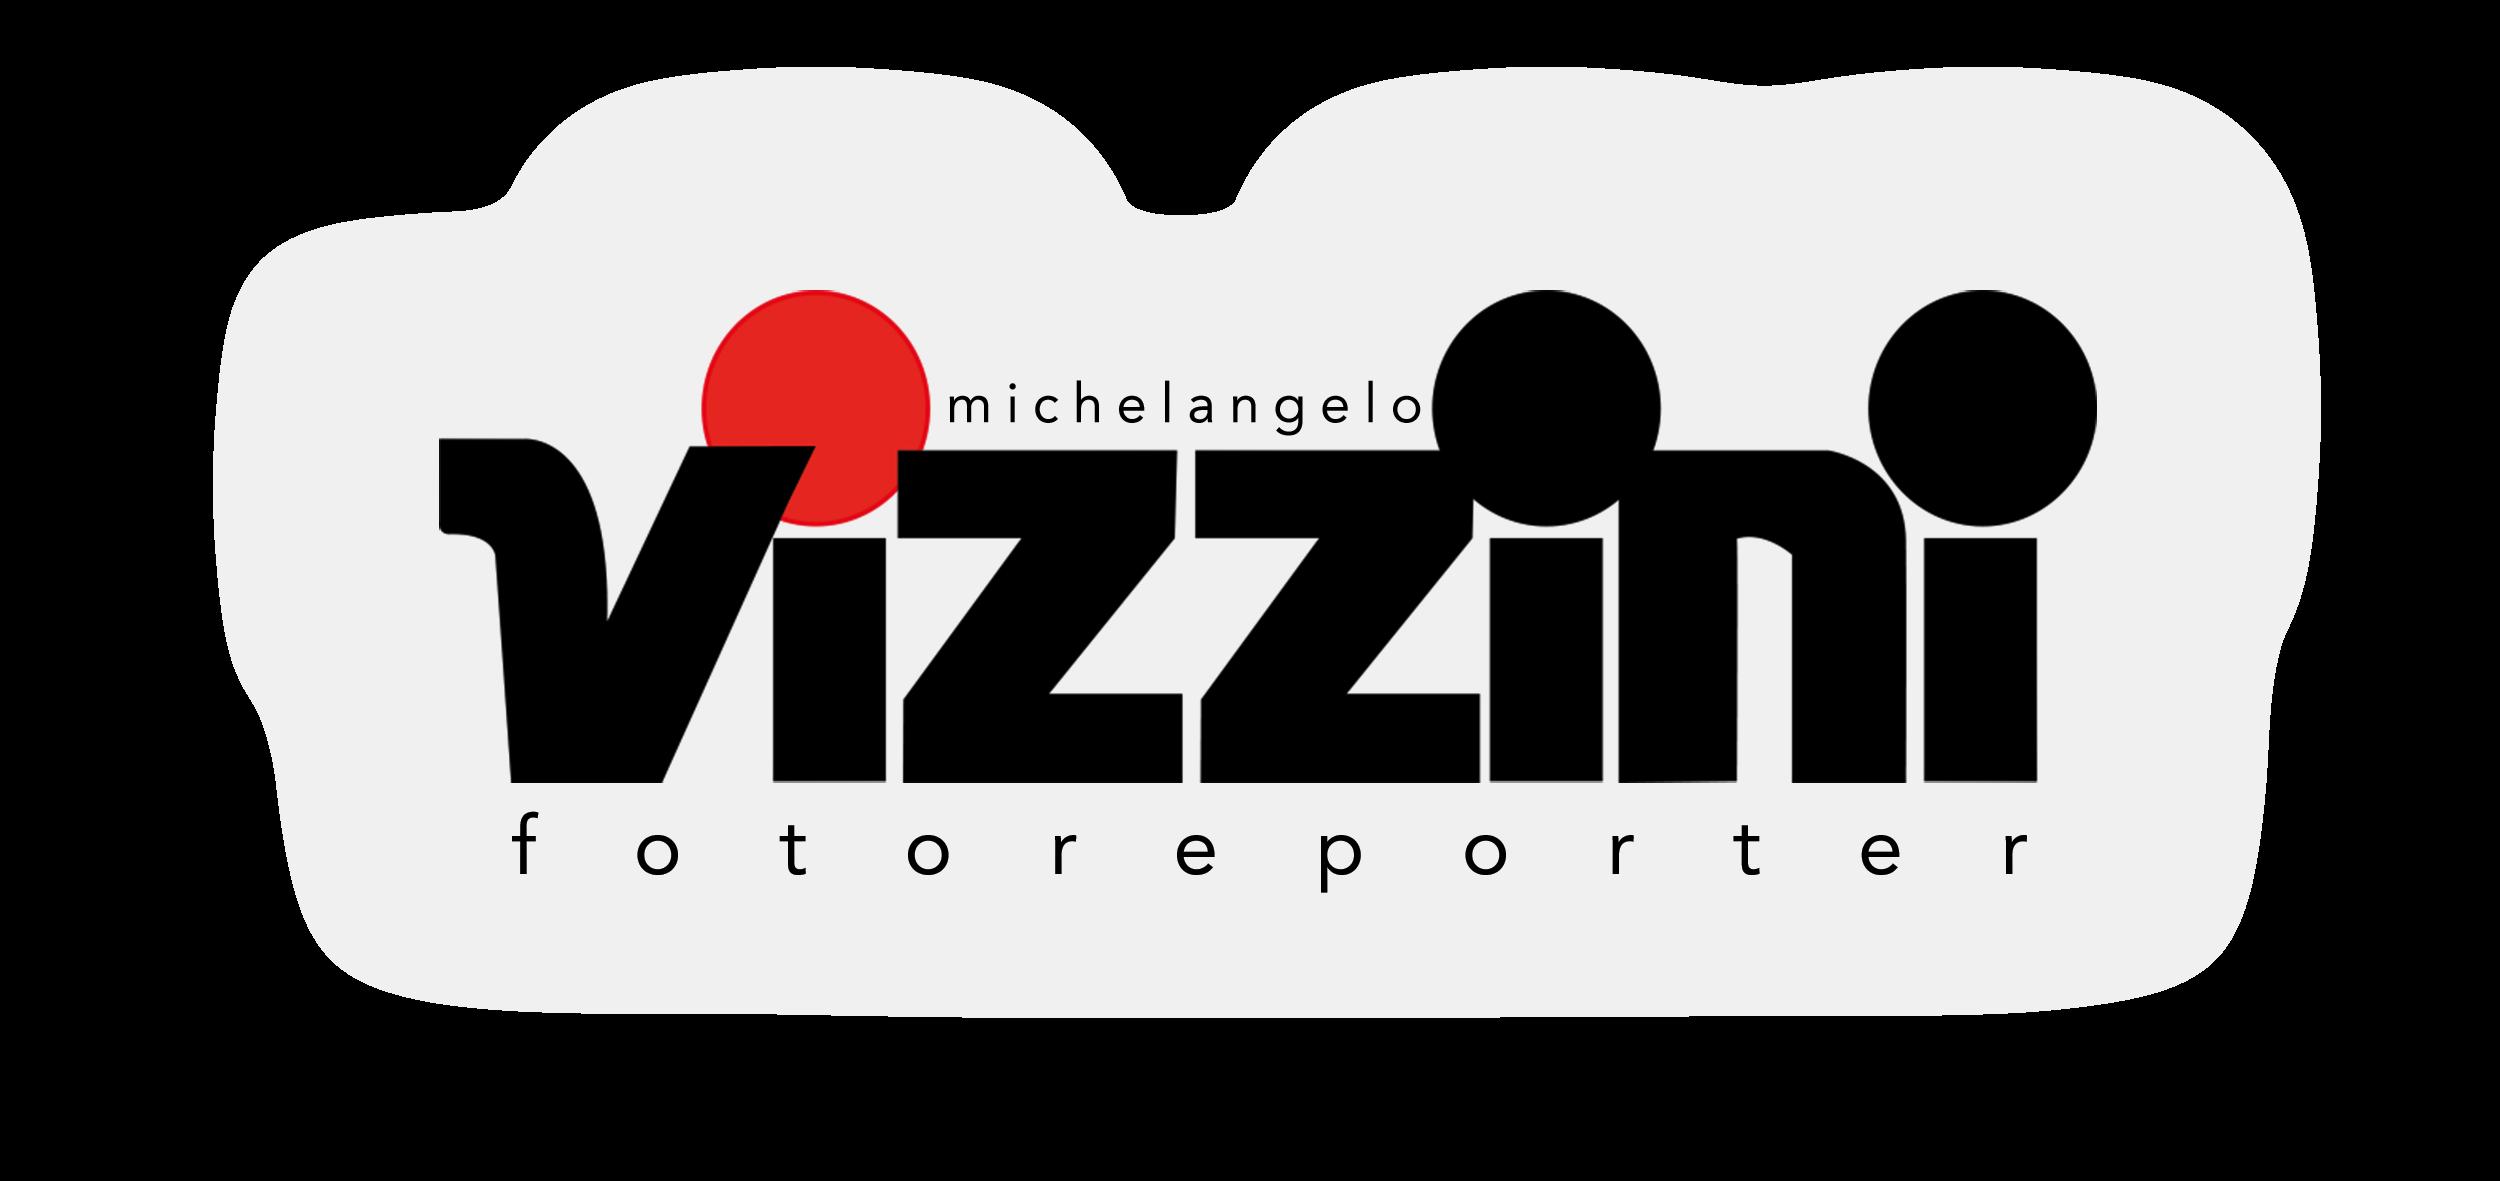 Michelangelo Vizzini Fotoreporter